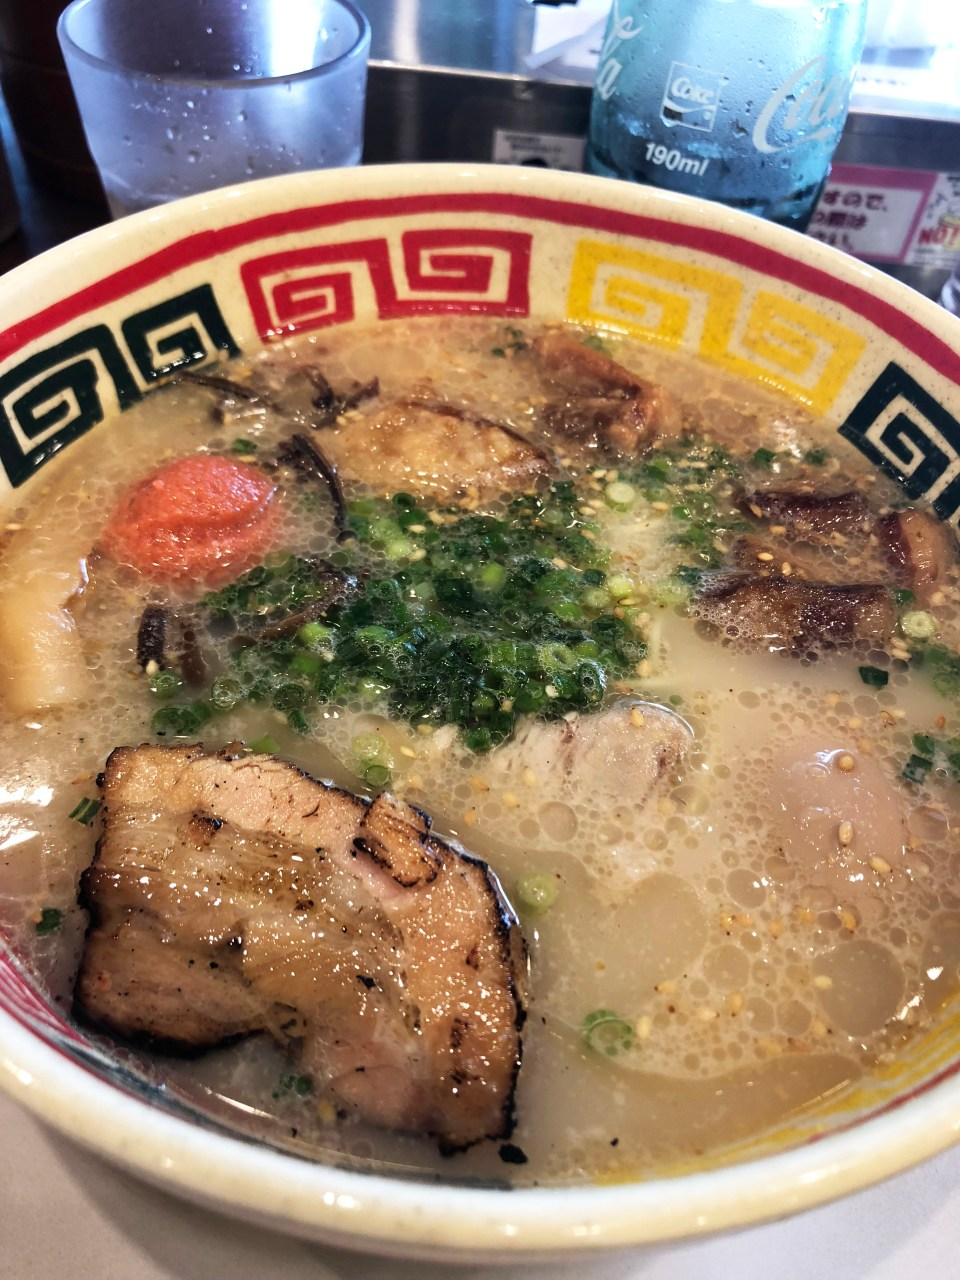 Kyushu Jangara - Ramen with Pork Broth